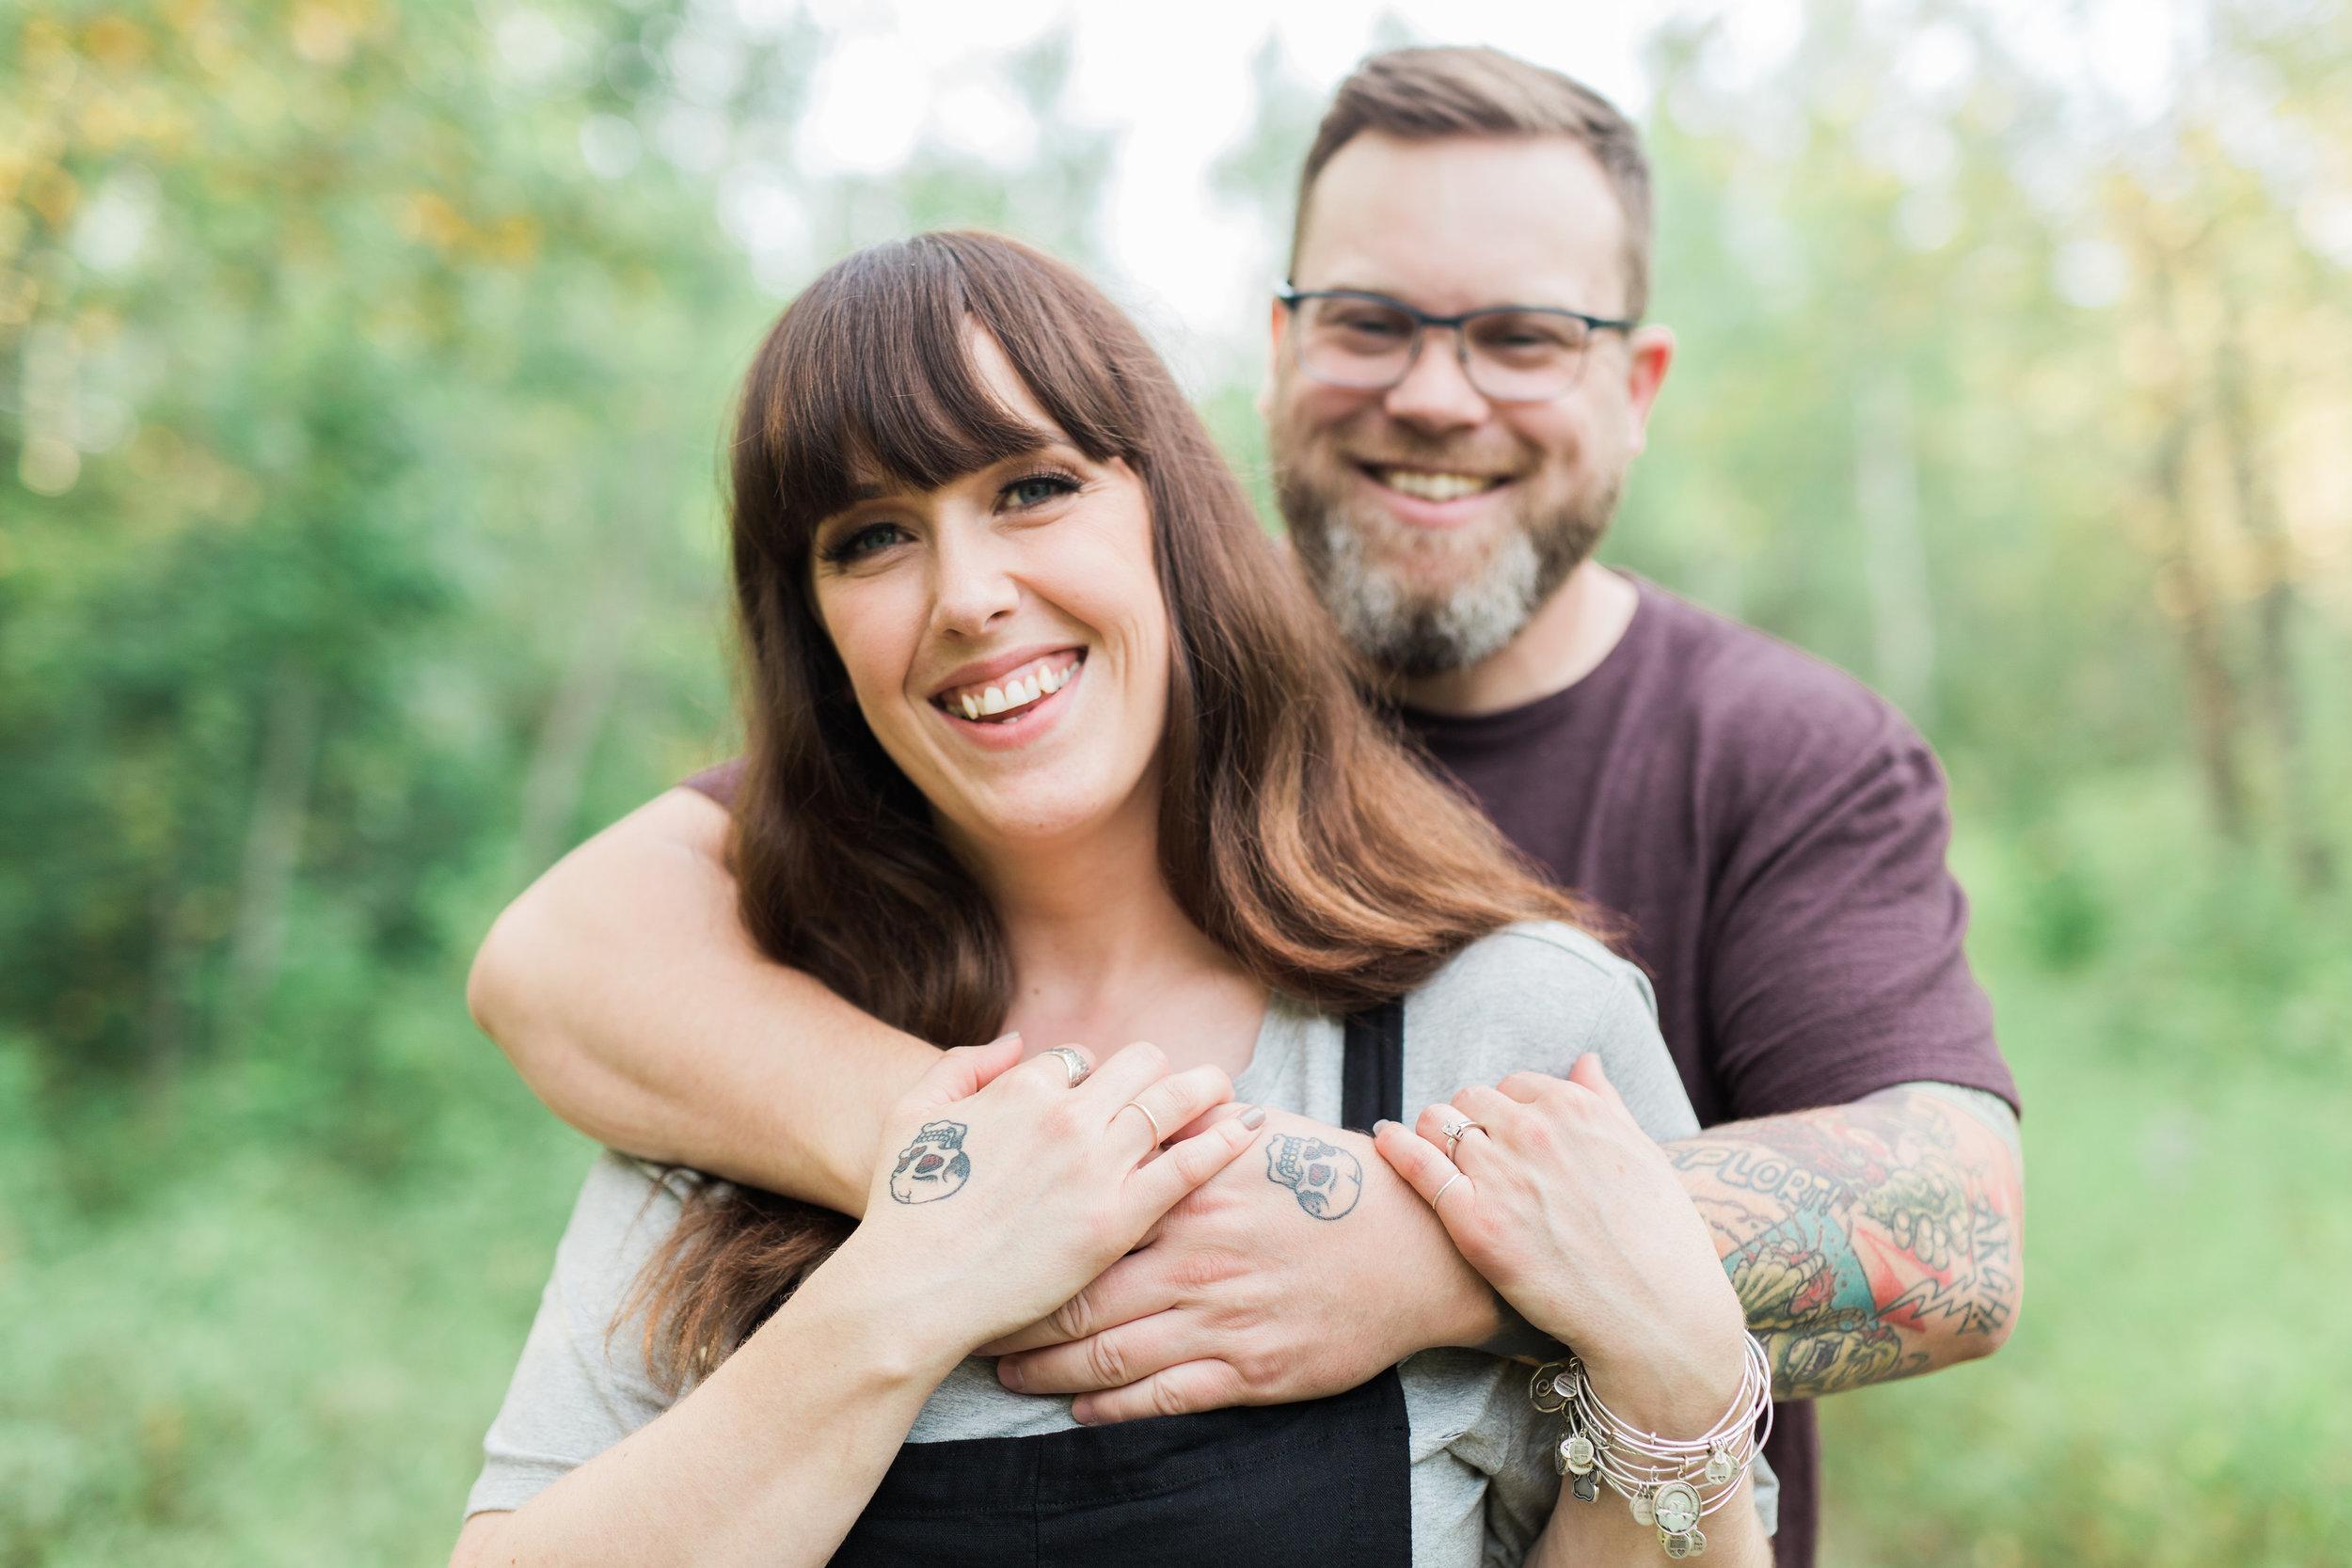 Christine&Sean_FirstGlanceStudios-46.jpg